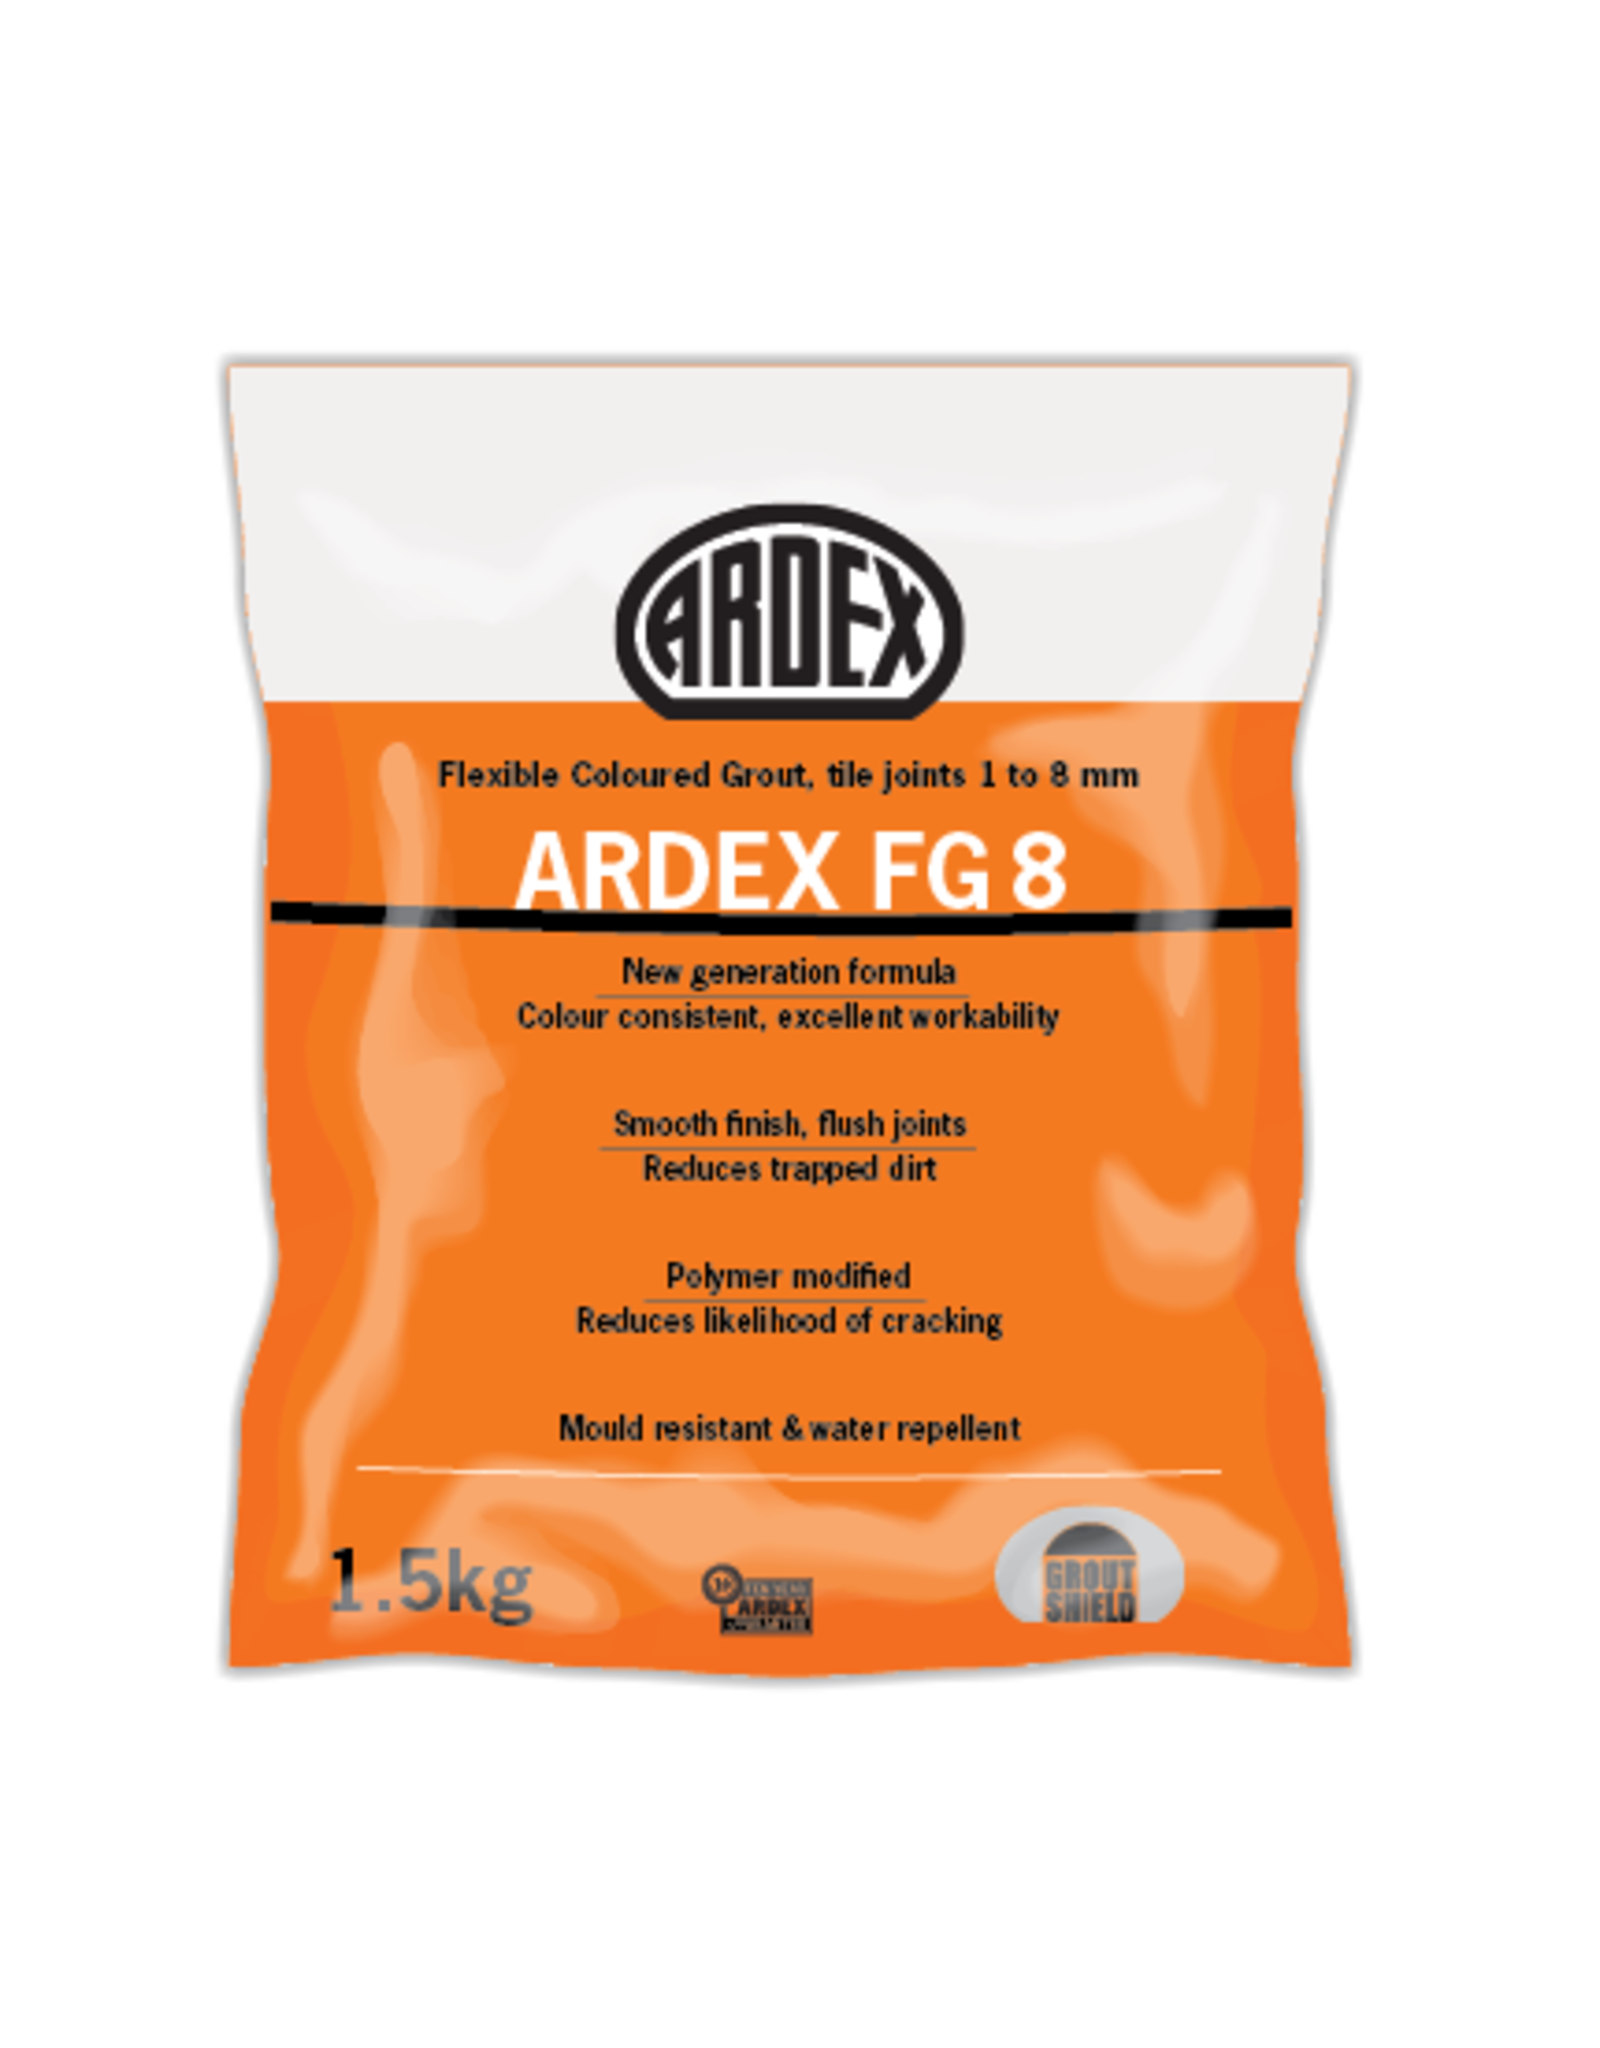 Ardex ARDEX FG8 Havana 280 5kg